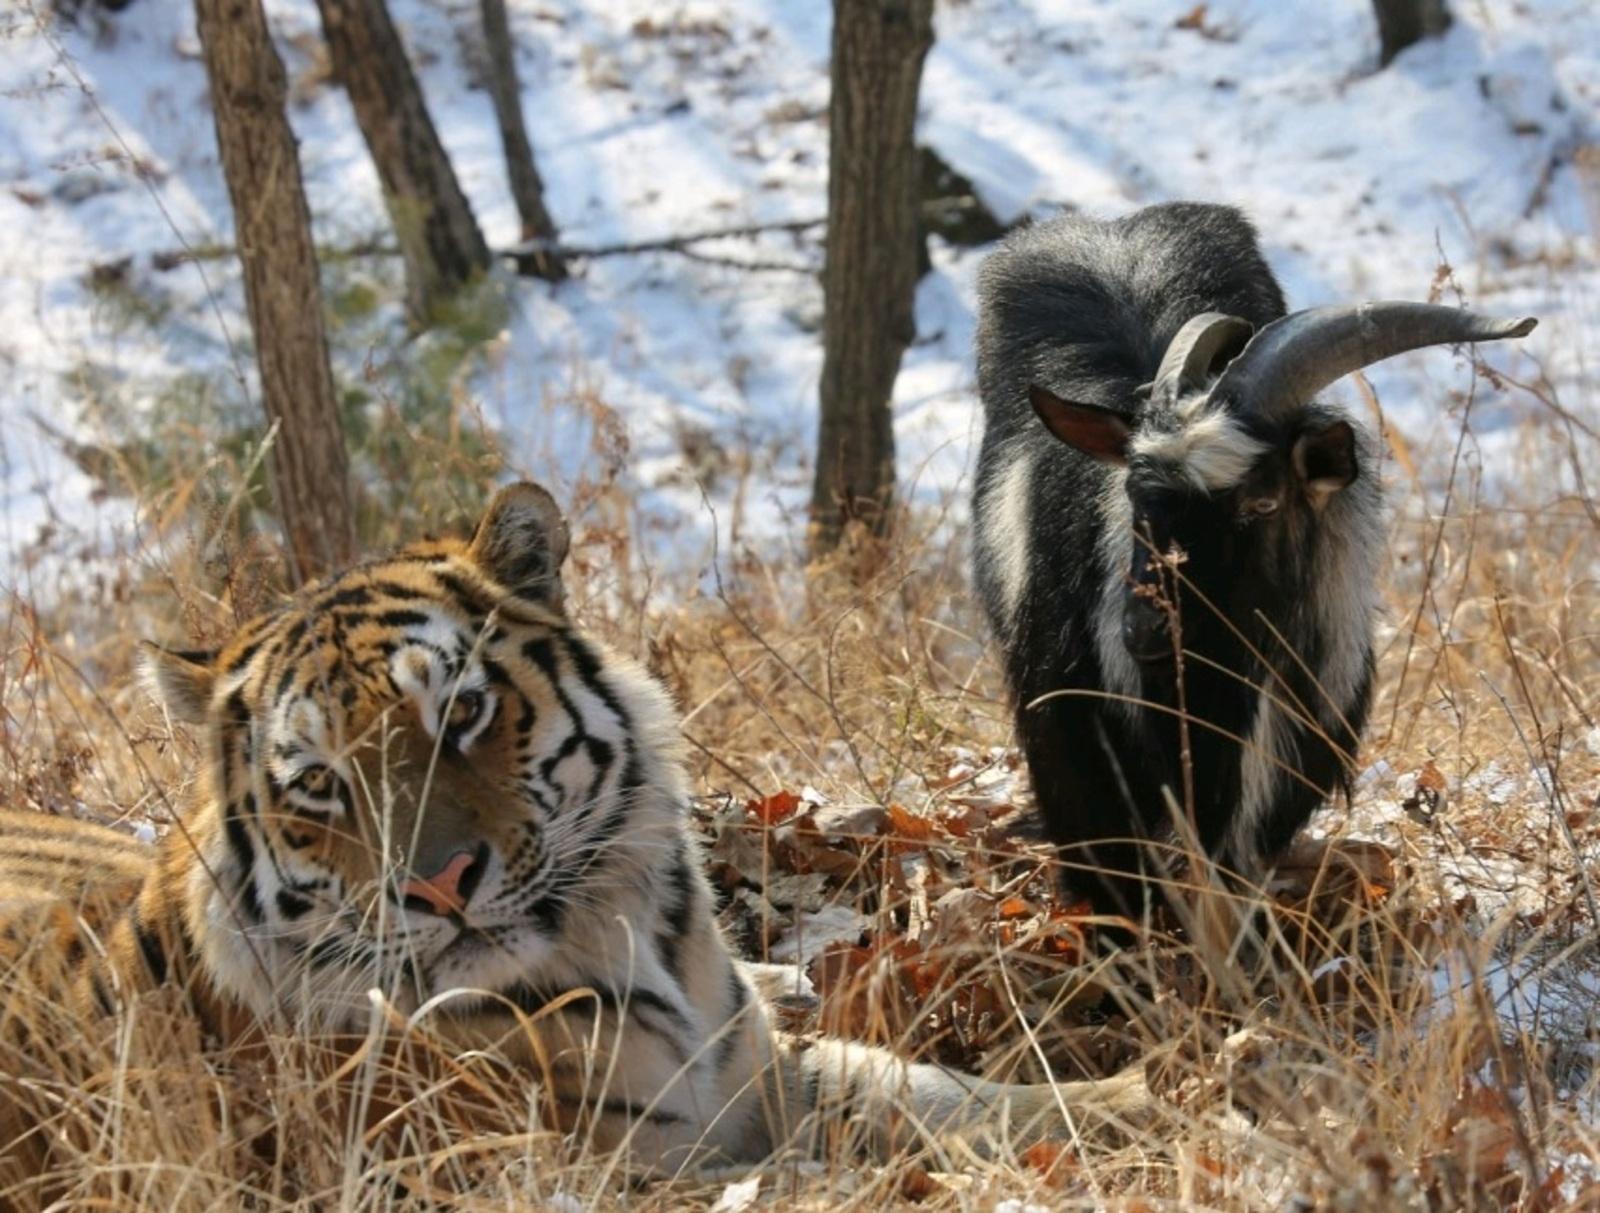 Амур и Тимур неразлучны на прогулке. / Дмитрий Мезенцев, официальный сайт Приморского сафари-парка (safaripark25.ru)